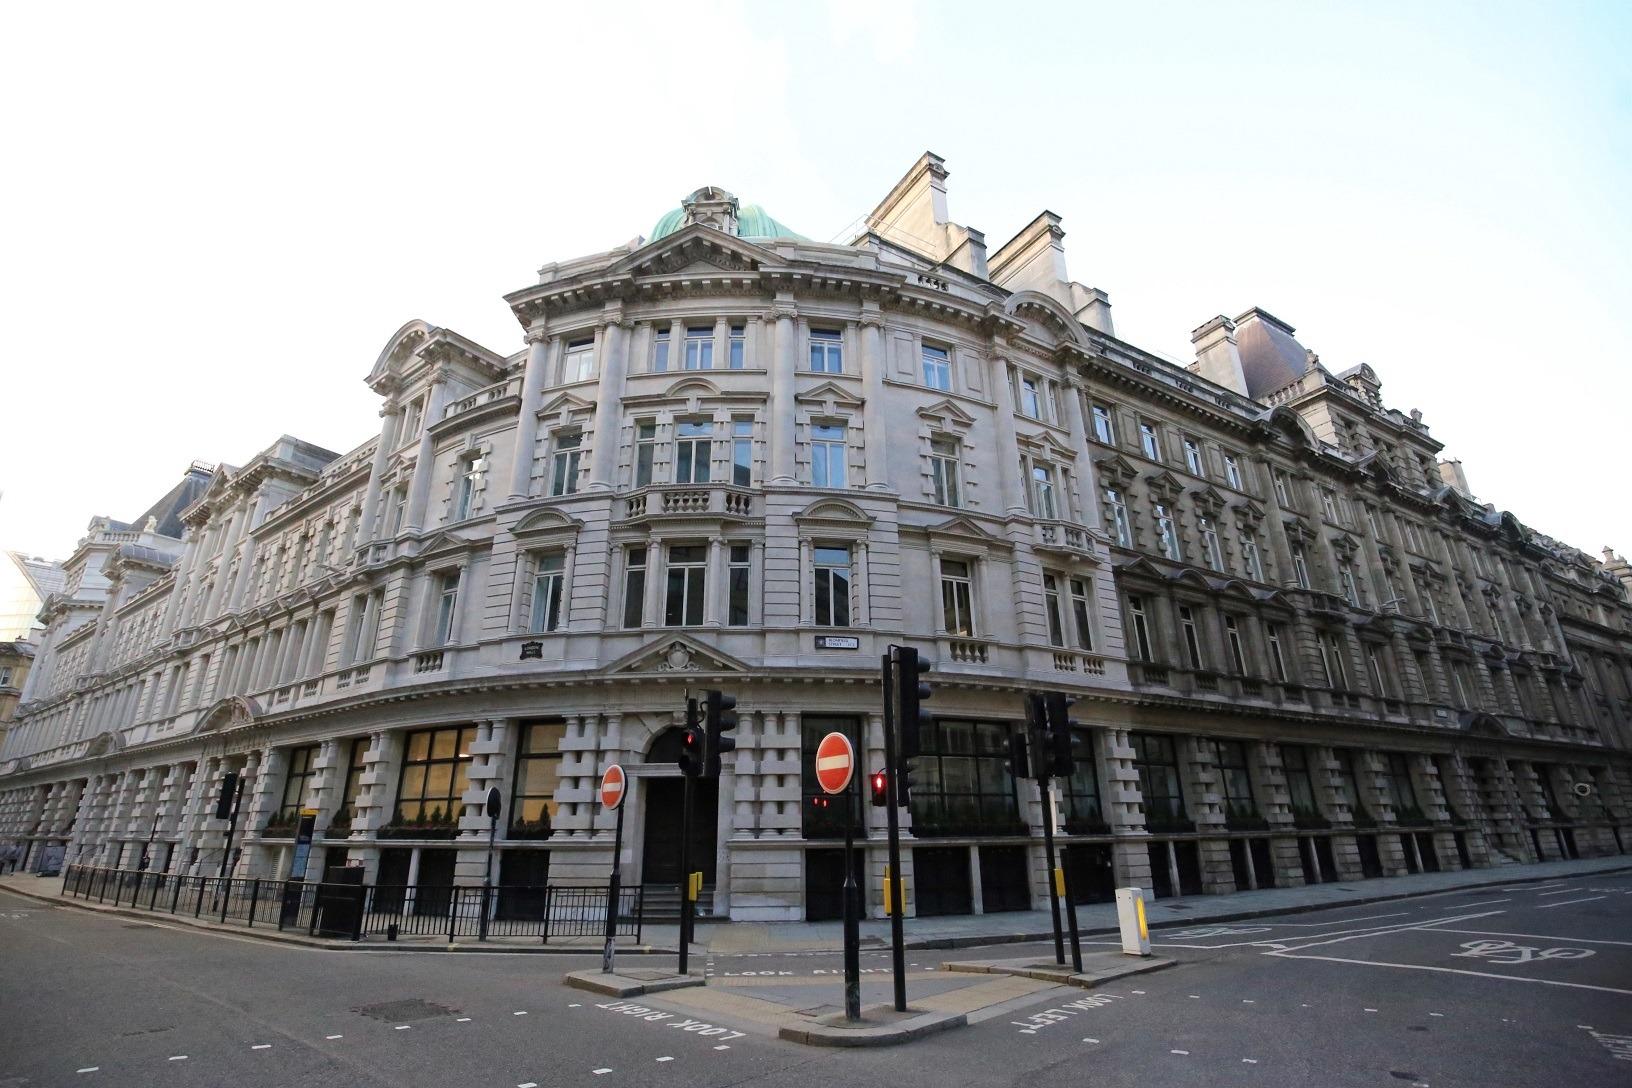 London Wall Buildings moorgate